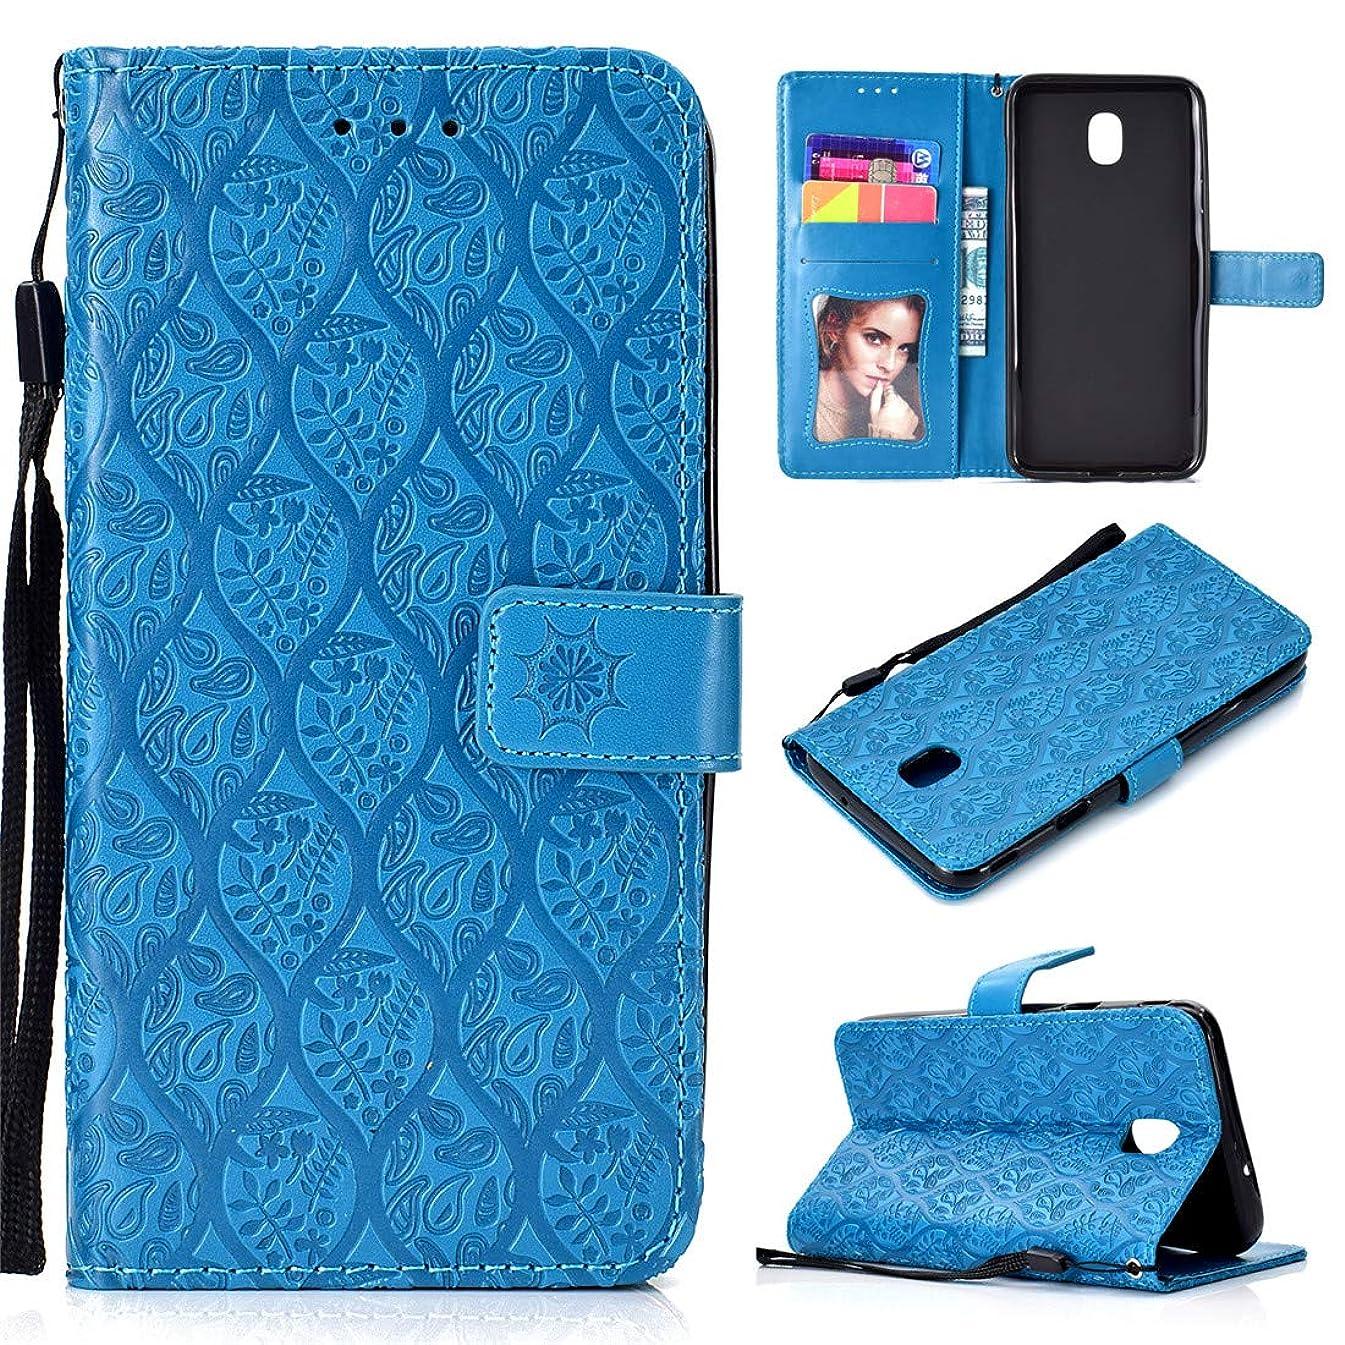 Samsung Galaxy J7 2018/J7 Aero/J7 Aura/J7 Top/J7 Eon/J7 Star Case, Lwaisy [Wrist Strap] [Kickstand] Premium Emboss Flower PU Leather Wallet Case Protective Cover with Card Slots - Blue